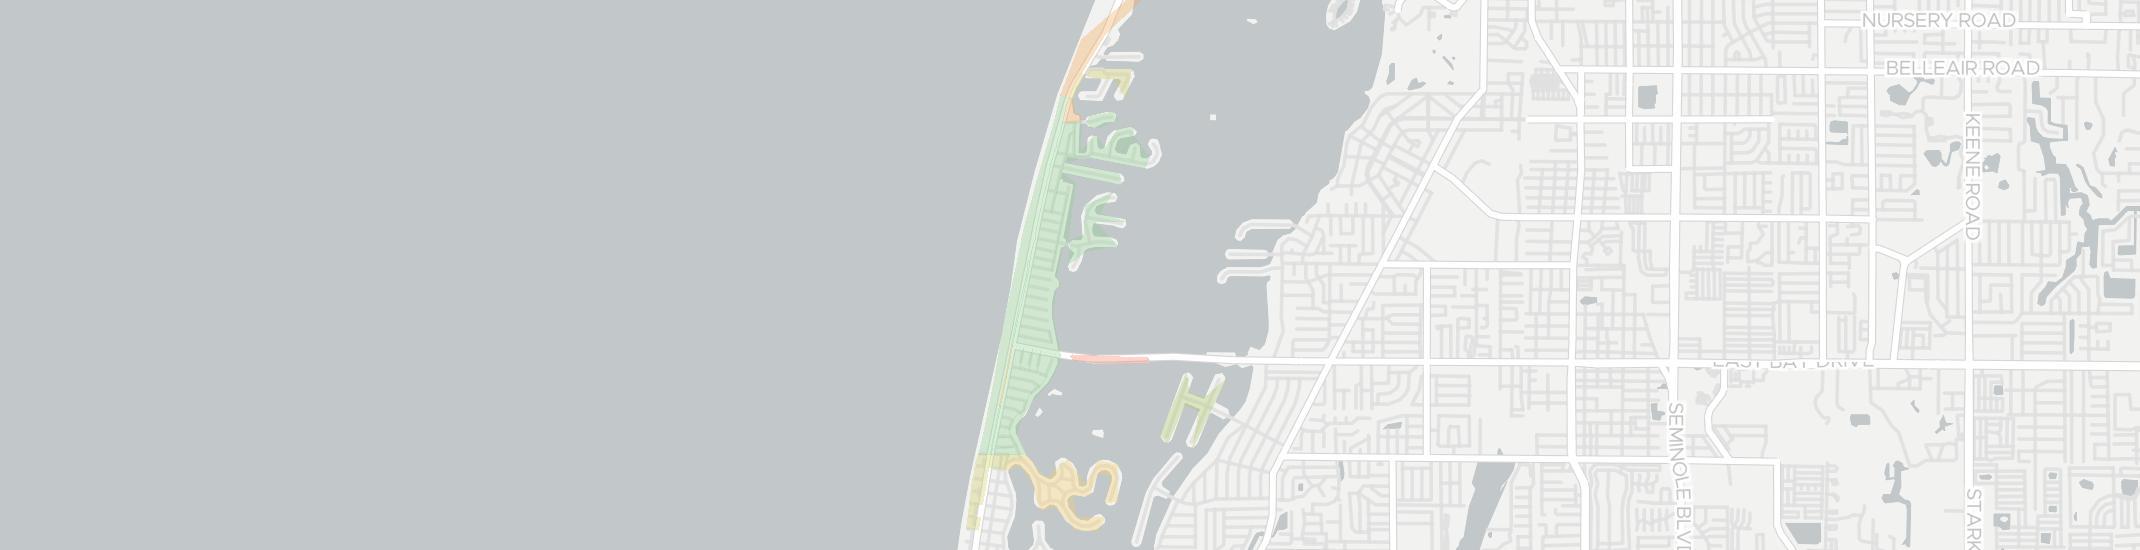 Internet Providers In Belleair Beach Compare 8 Providers